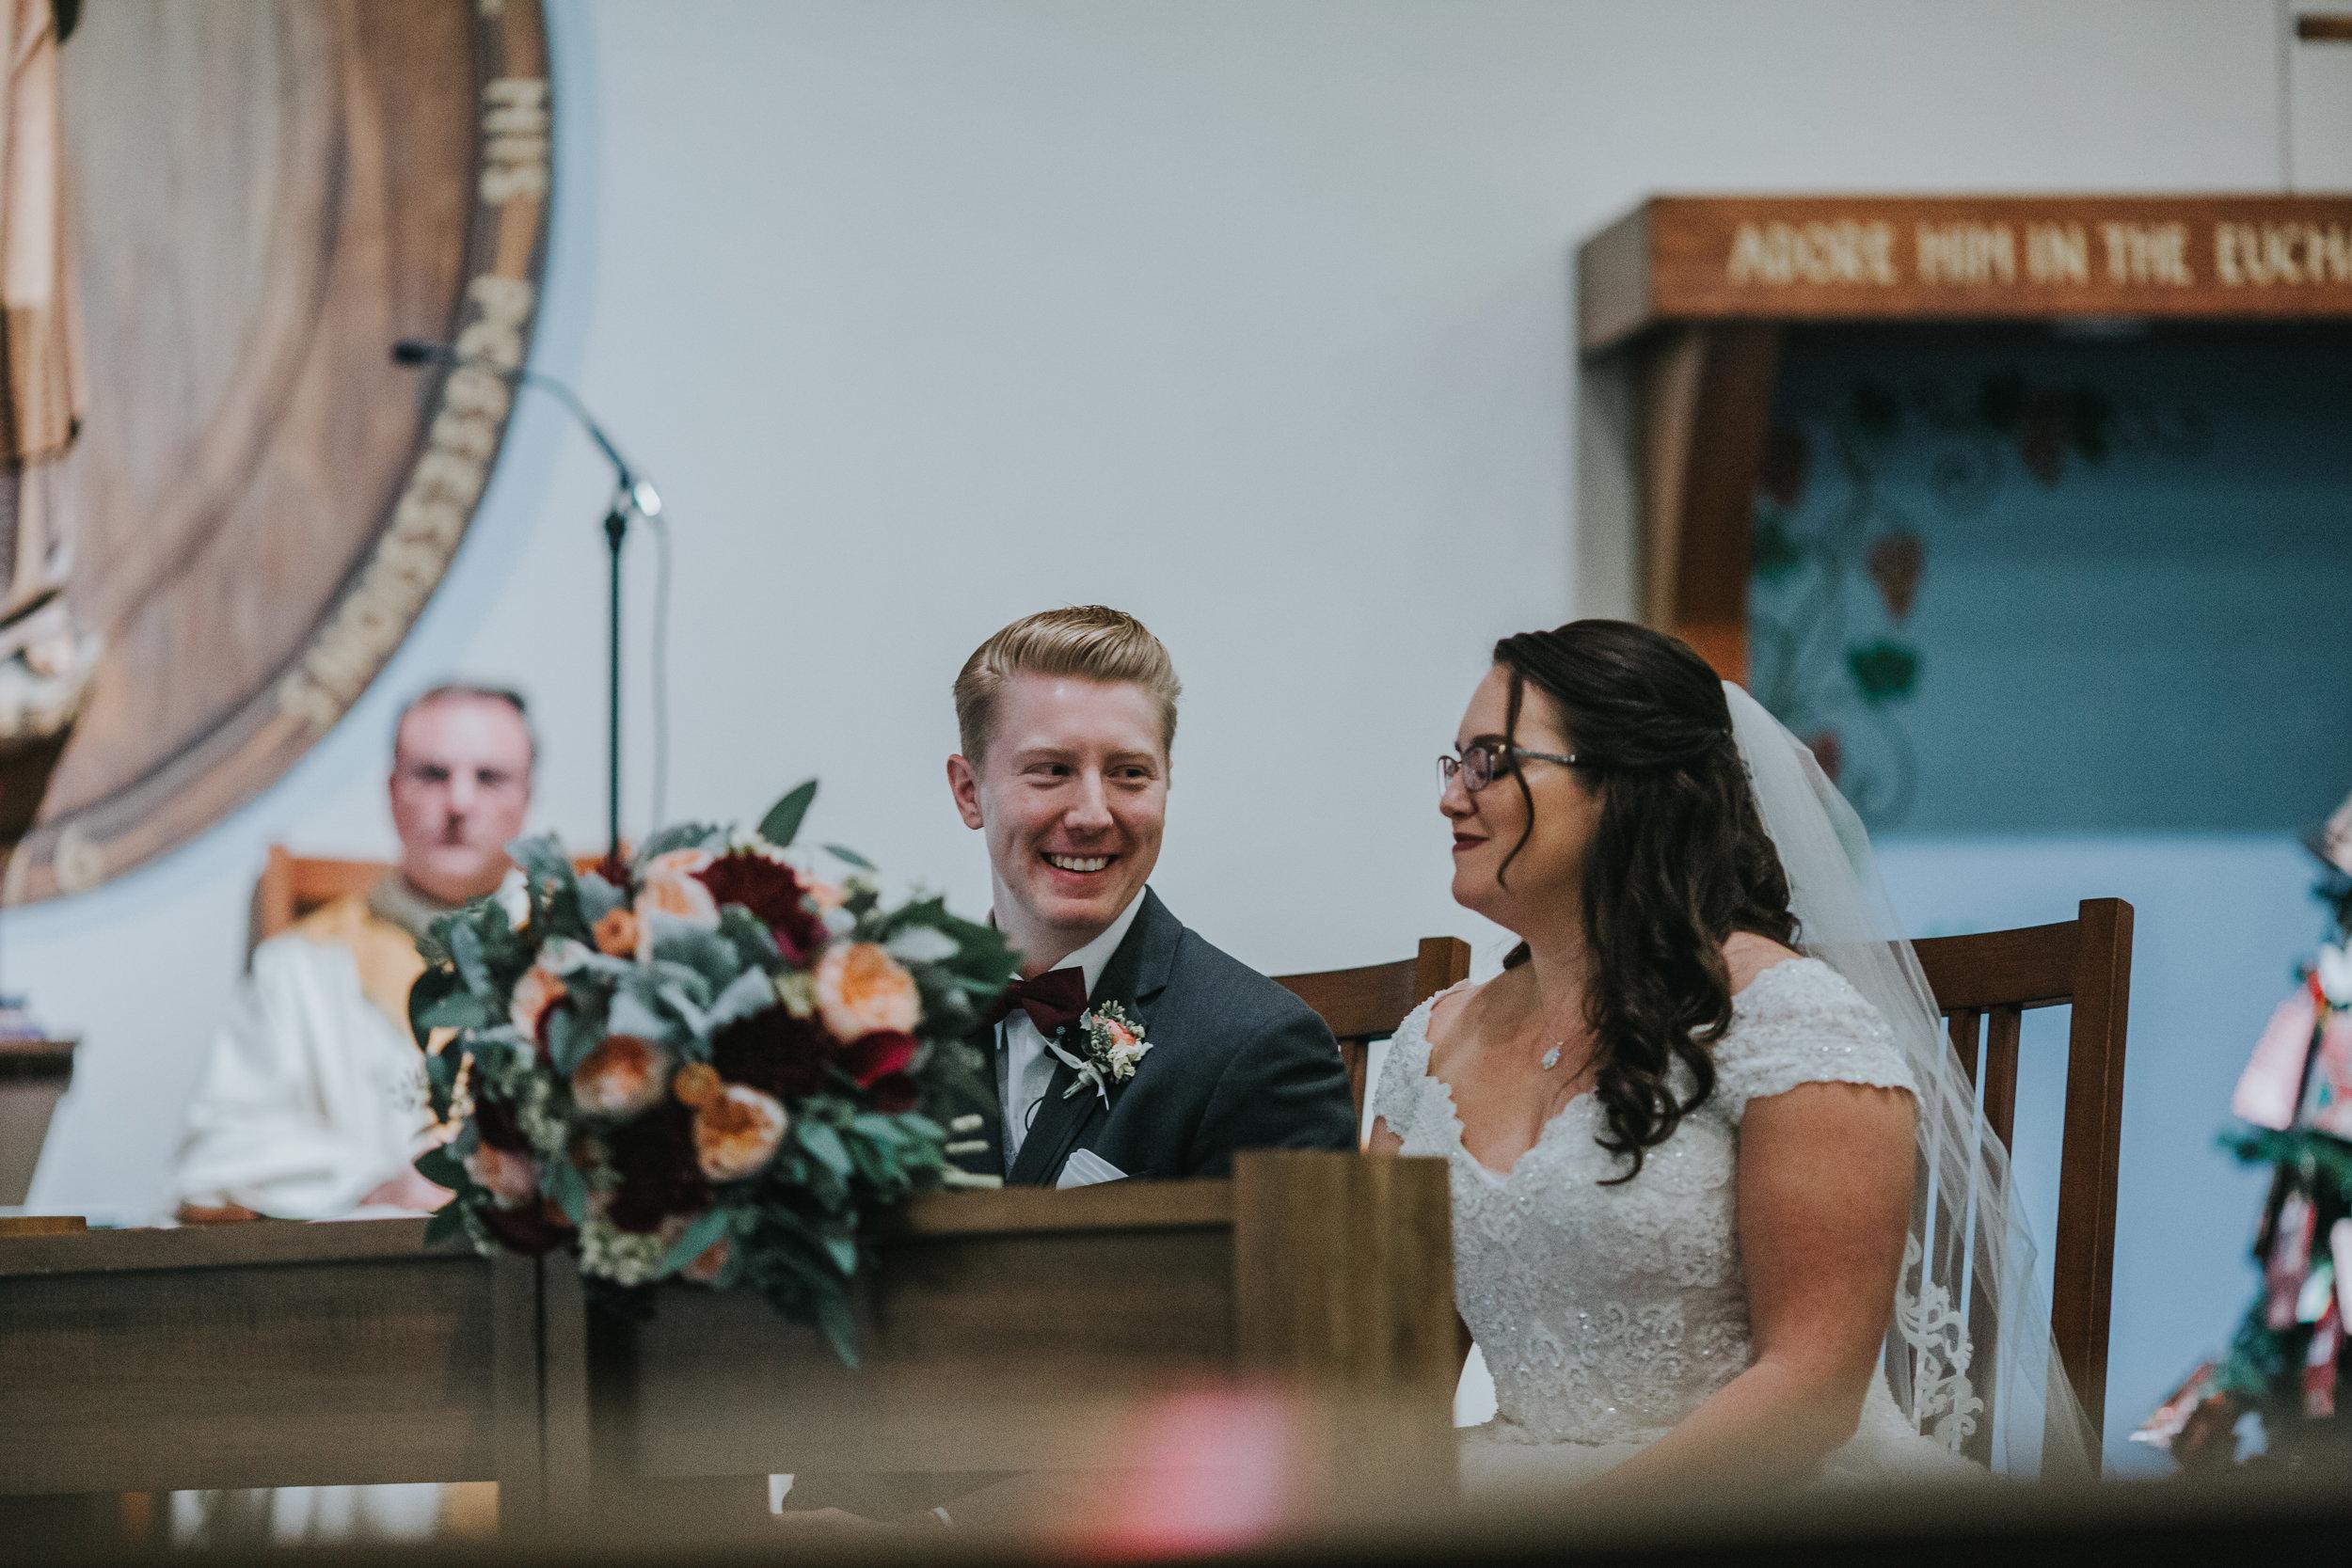 New-Jersey-Wedding-Photography-Fishers-Tudor-House-JennaLynnPhotography-Ceremony-Kathleen&Eddie-30.jpg